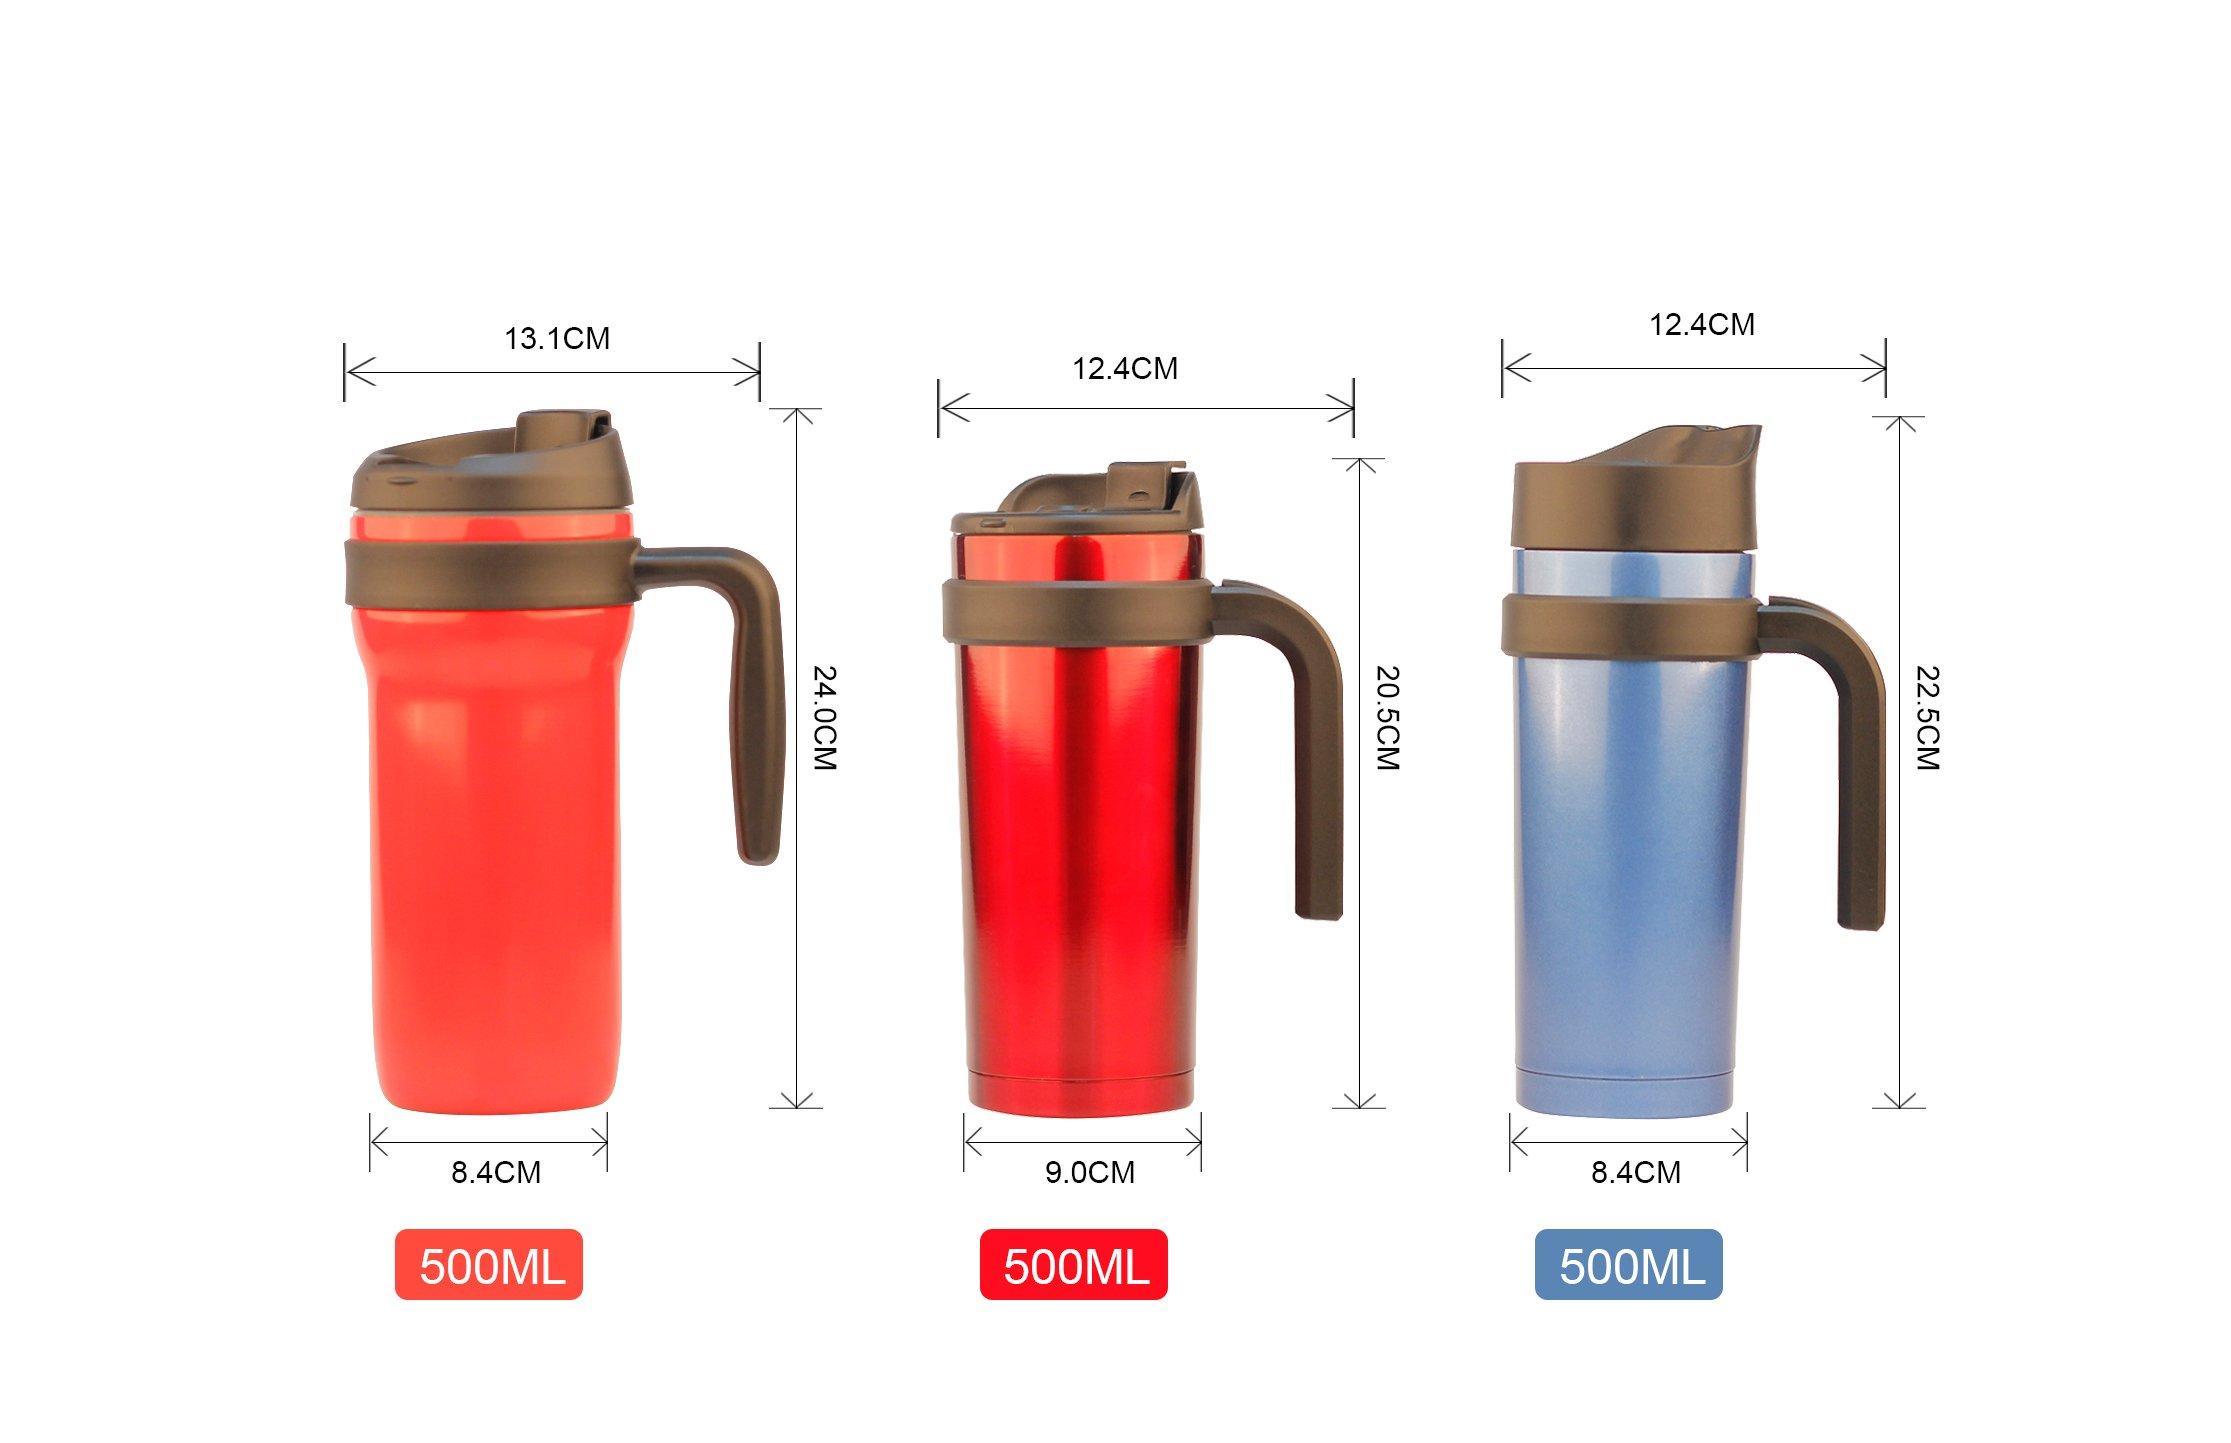 Coffee tumbler with handle